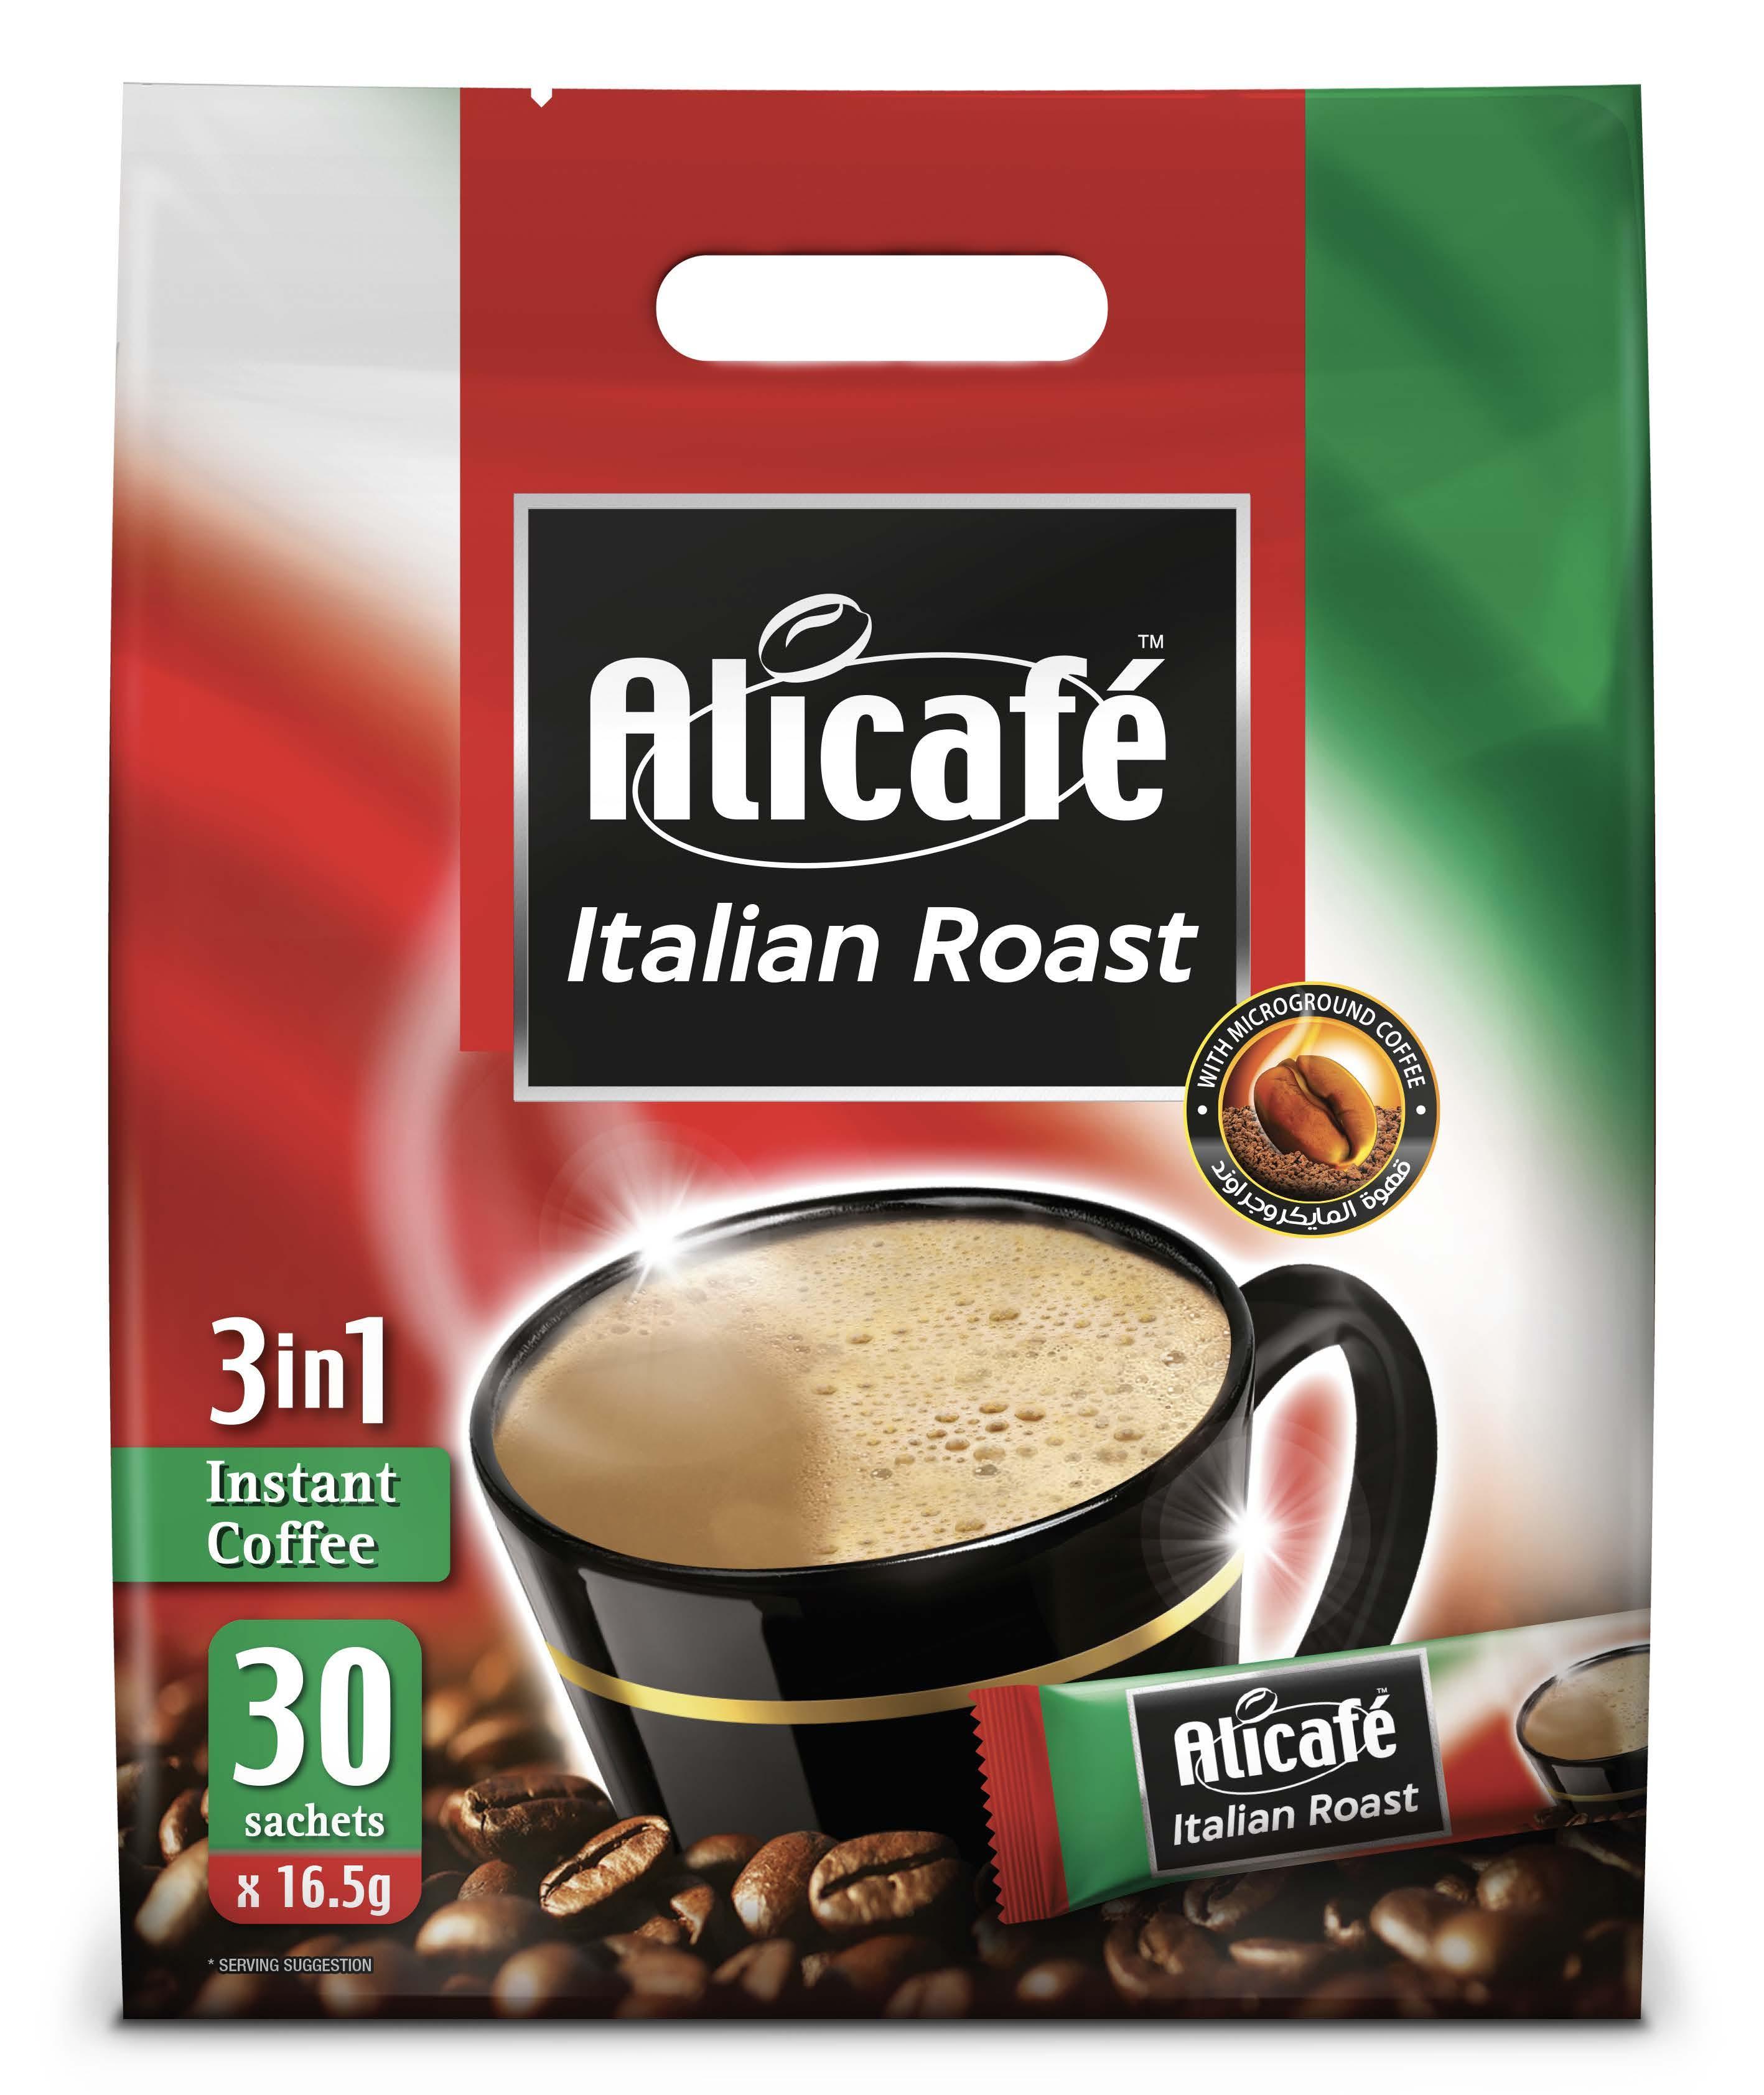 Alicafé Italian Roast 3in1